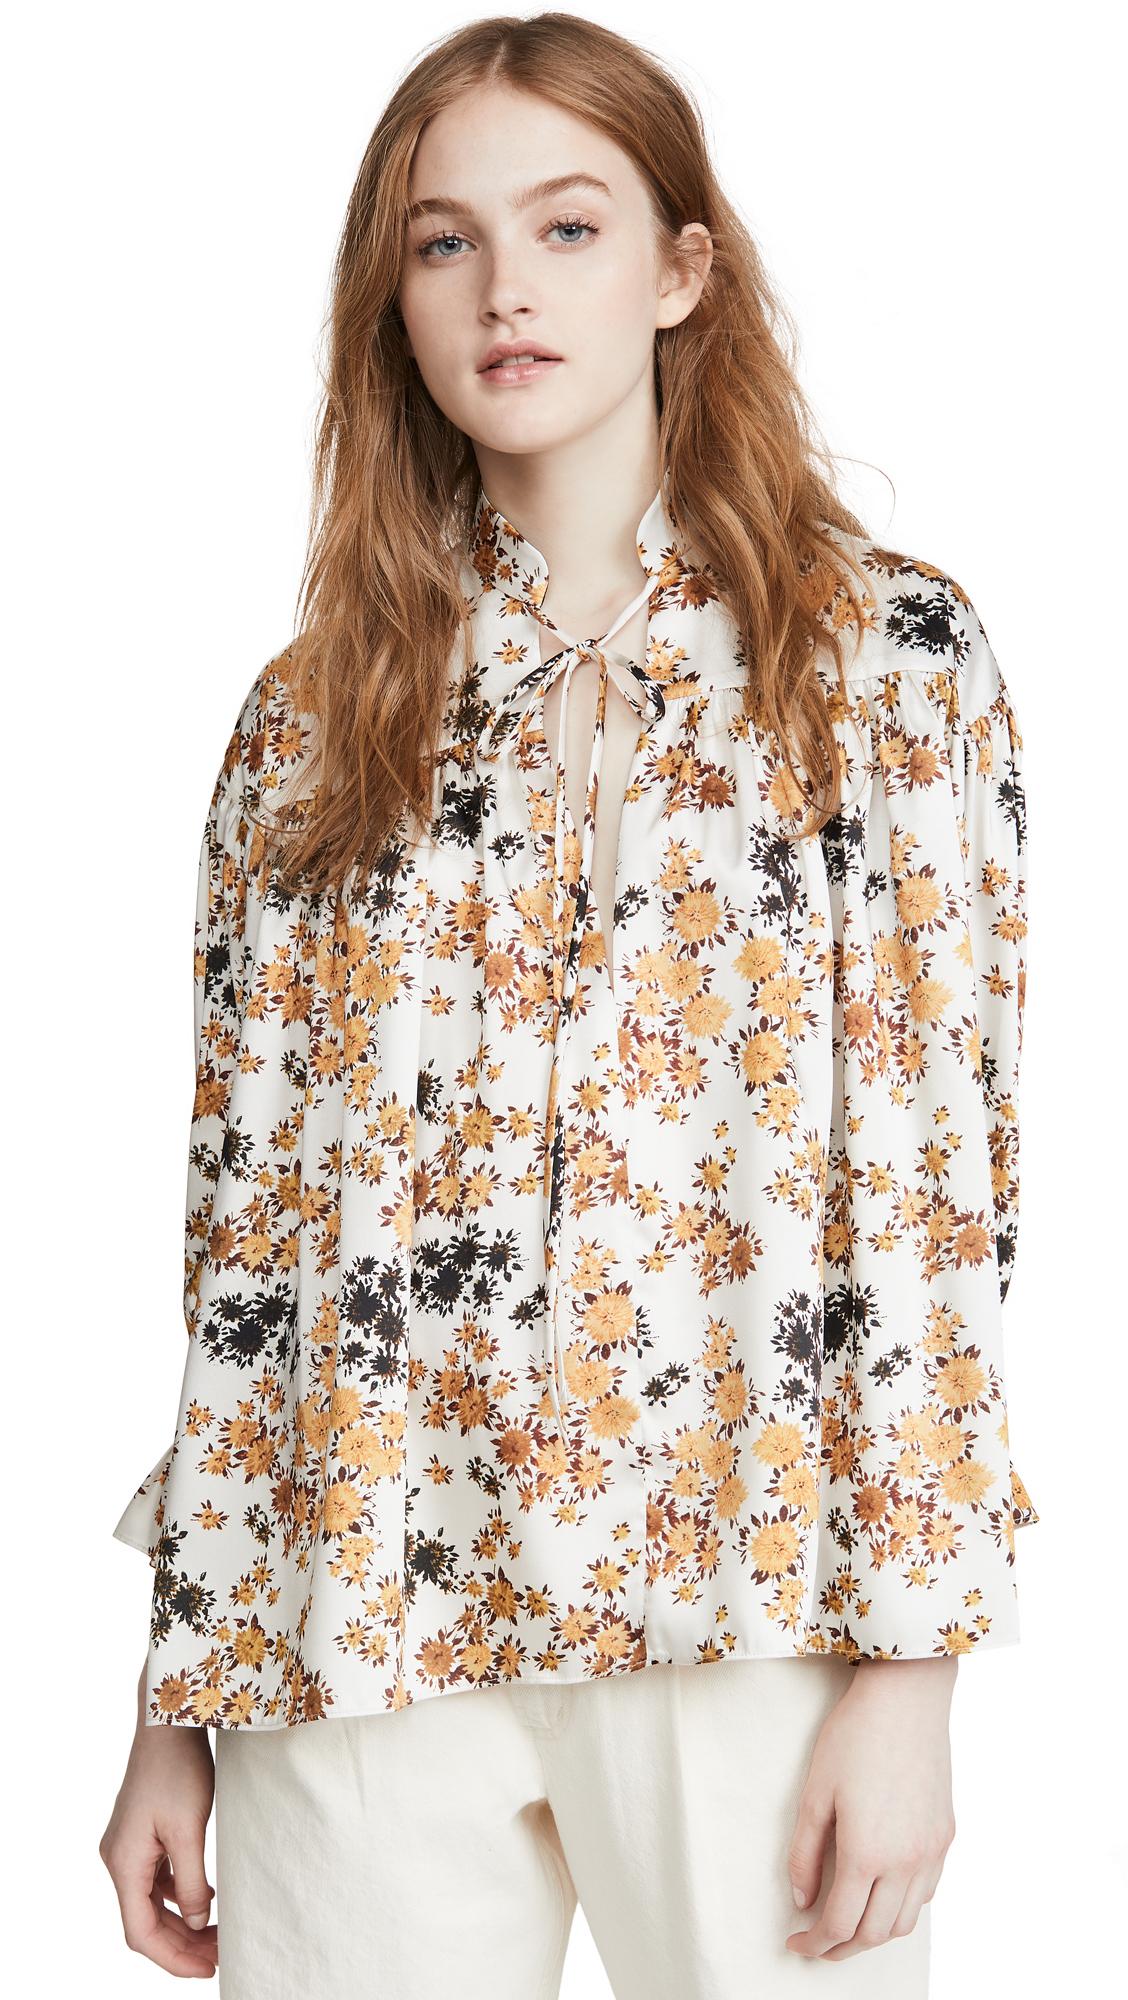 Victoria Victoria Beckham Tie Sleeve Overshirt - 30% Off Sale